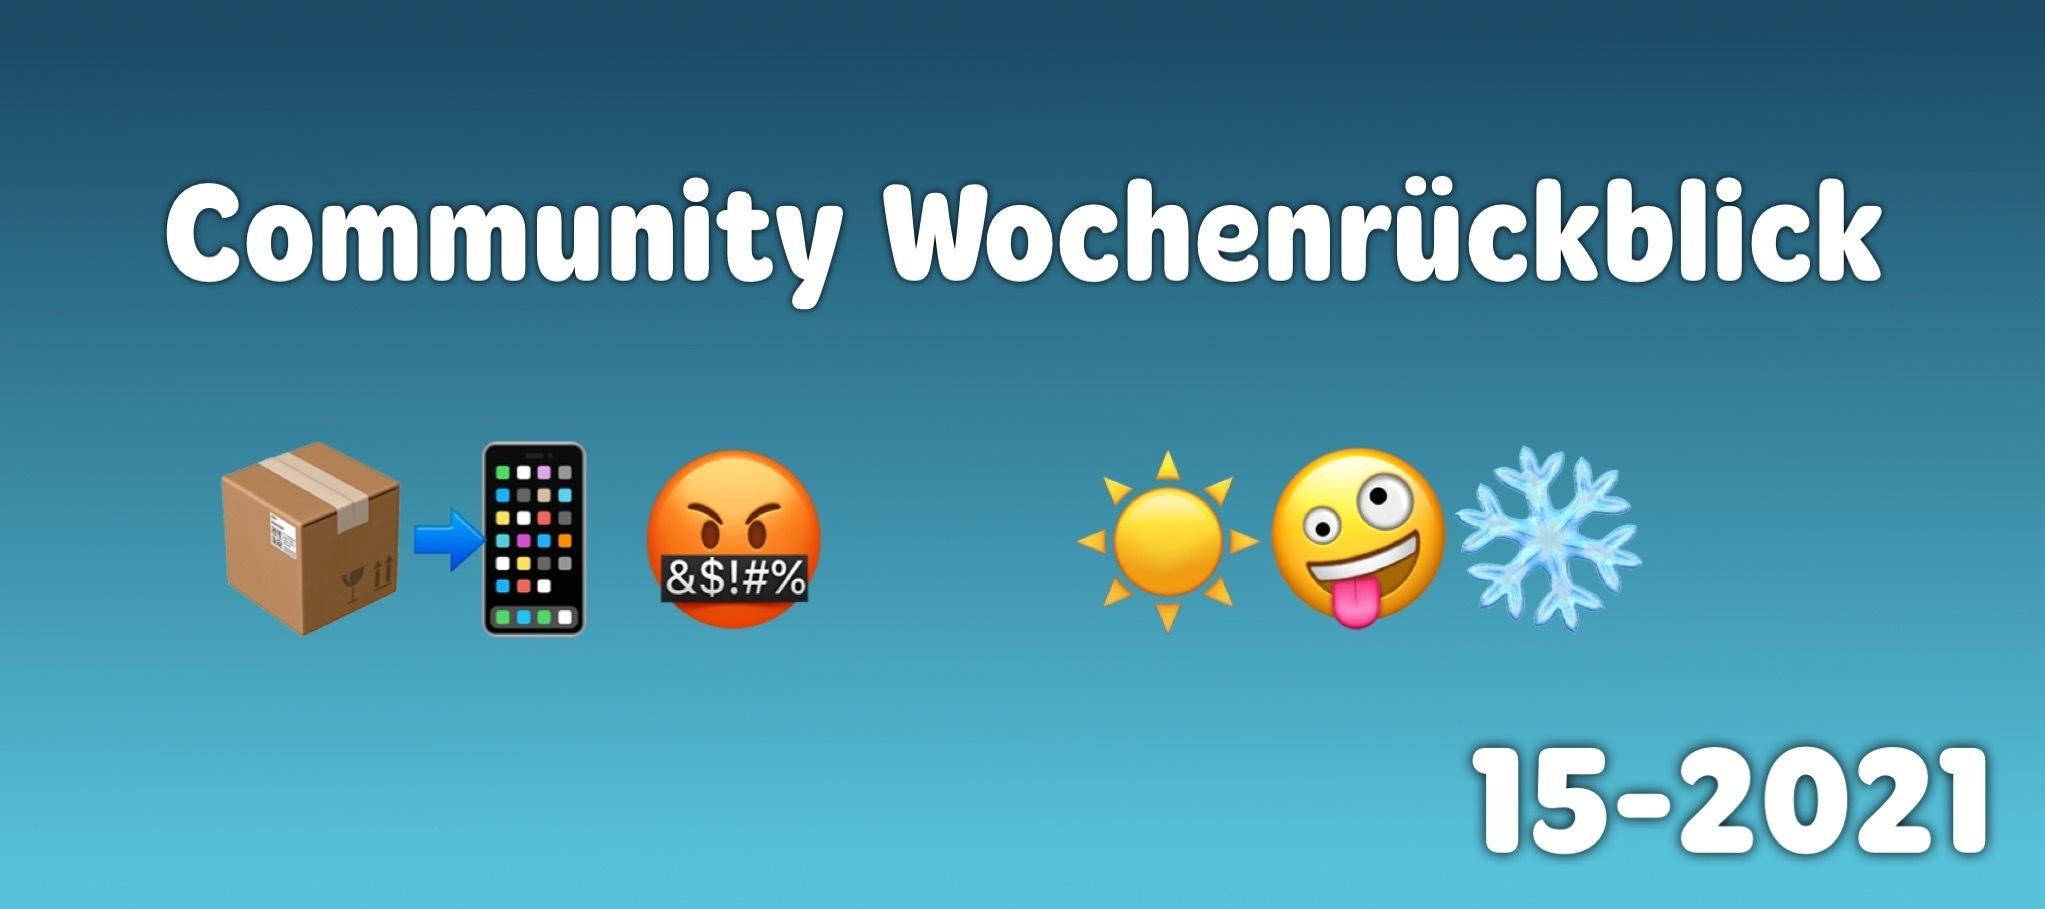 Community Wochenrückblick #15/2021